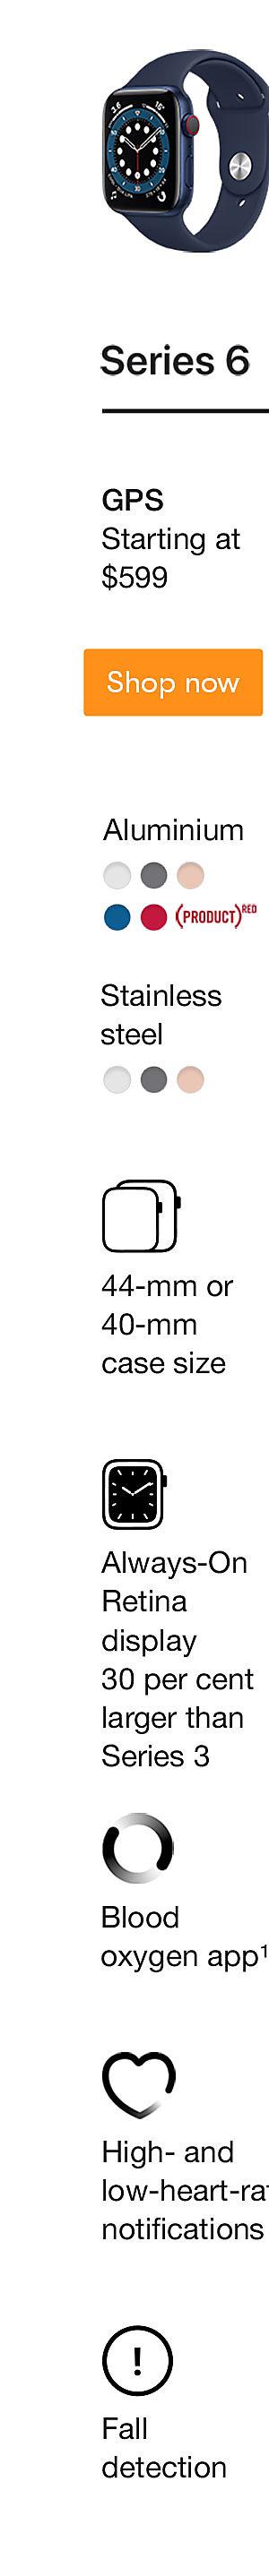 Apple Watch Series 6 Shop Now